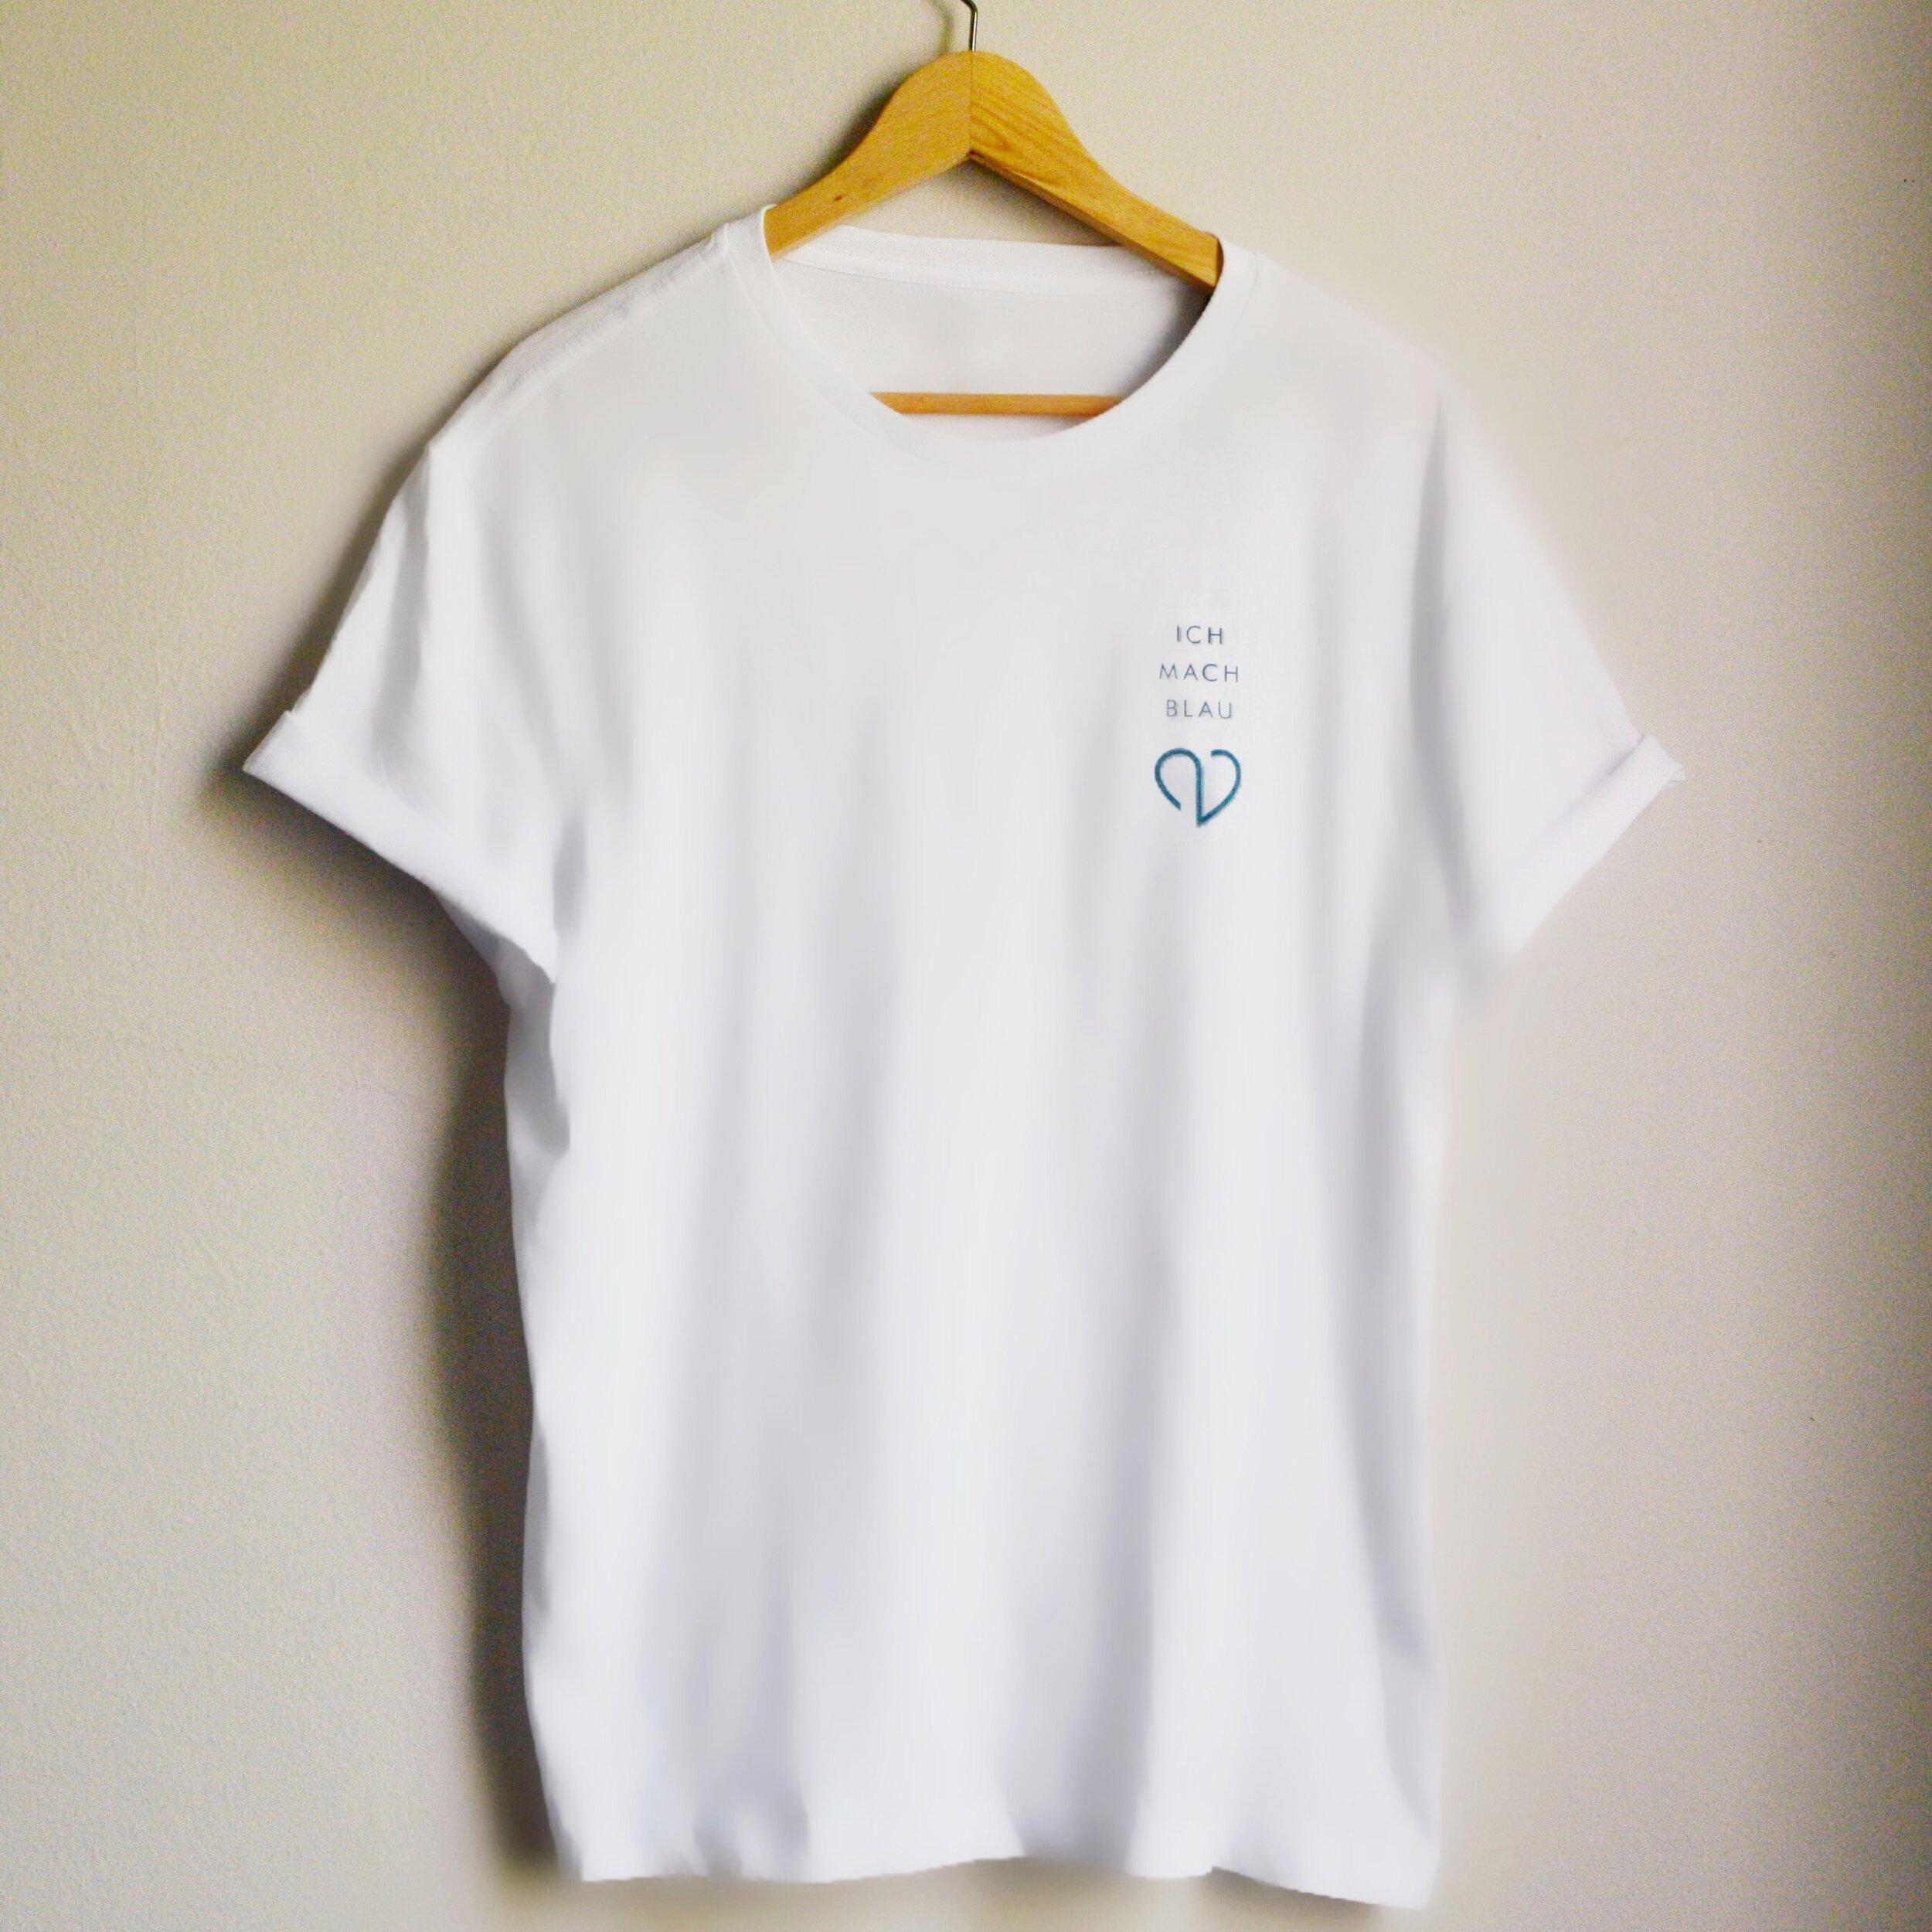 Bild 4 T Shirt Ich mach blau Männer a - Kopie.JPG